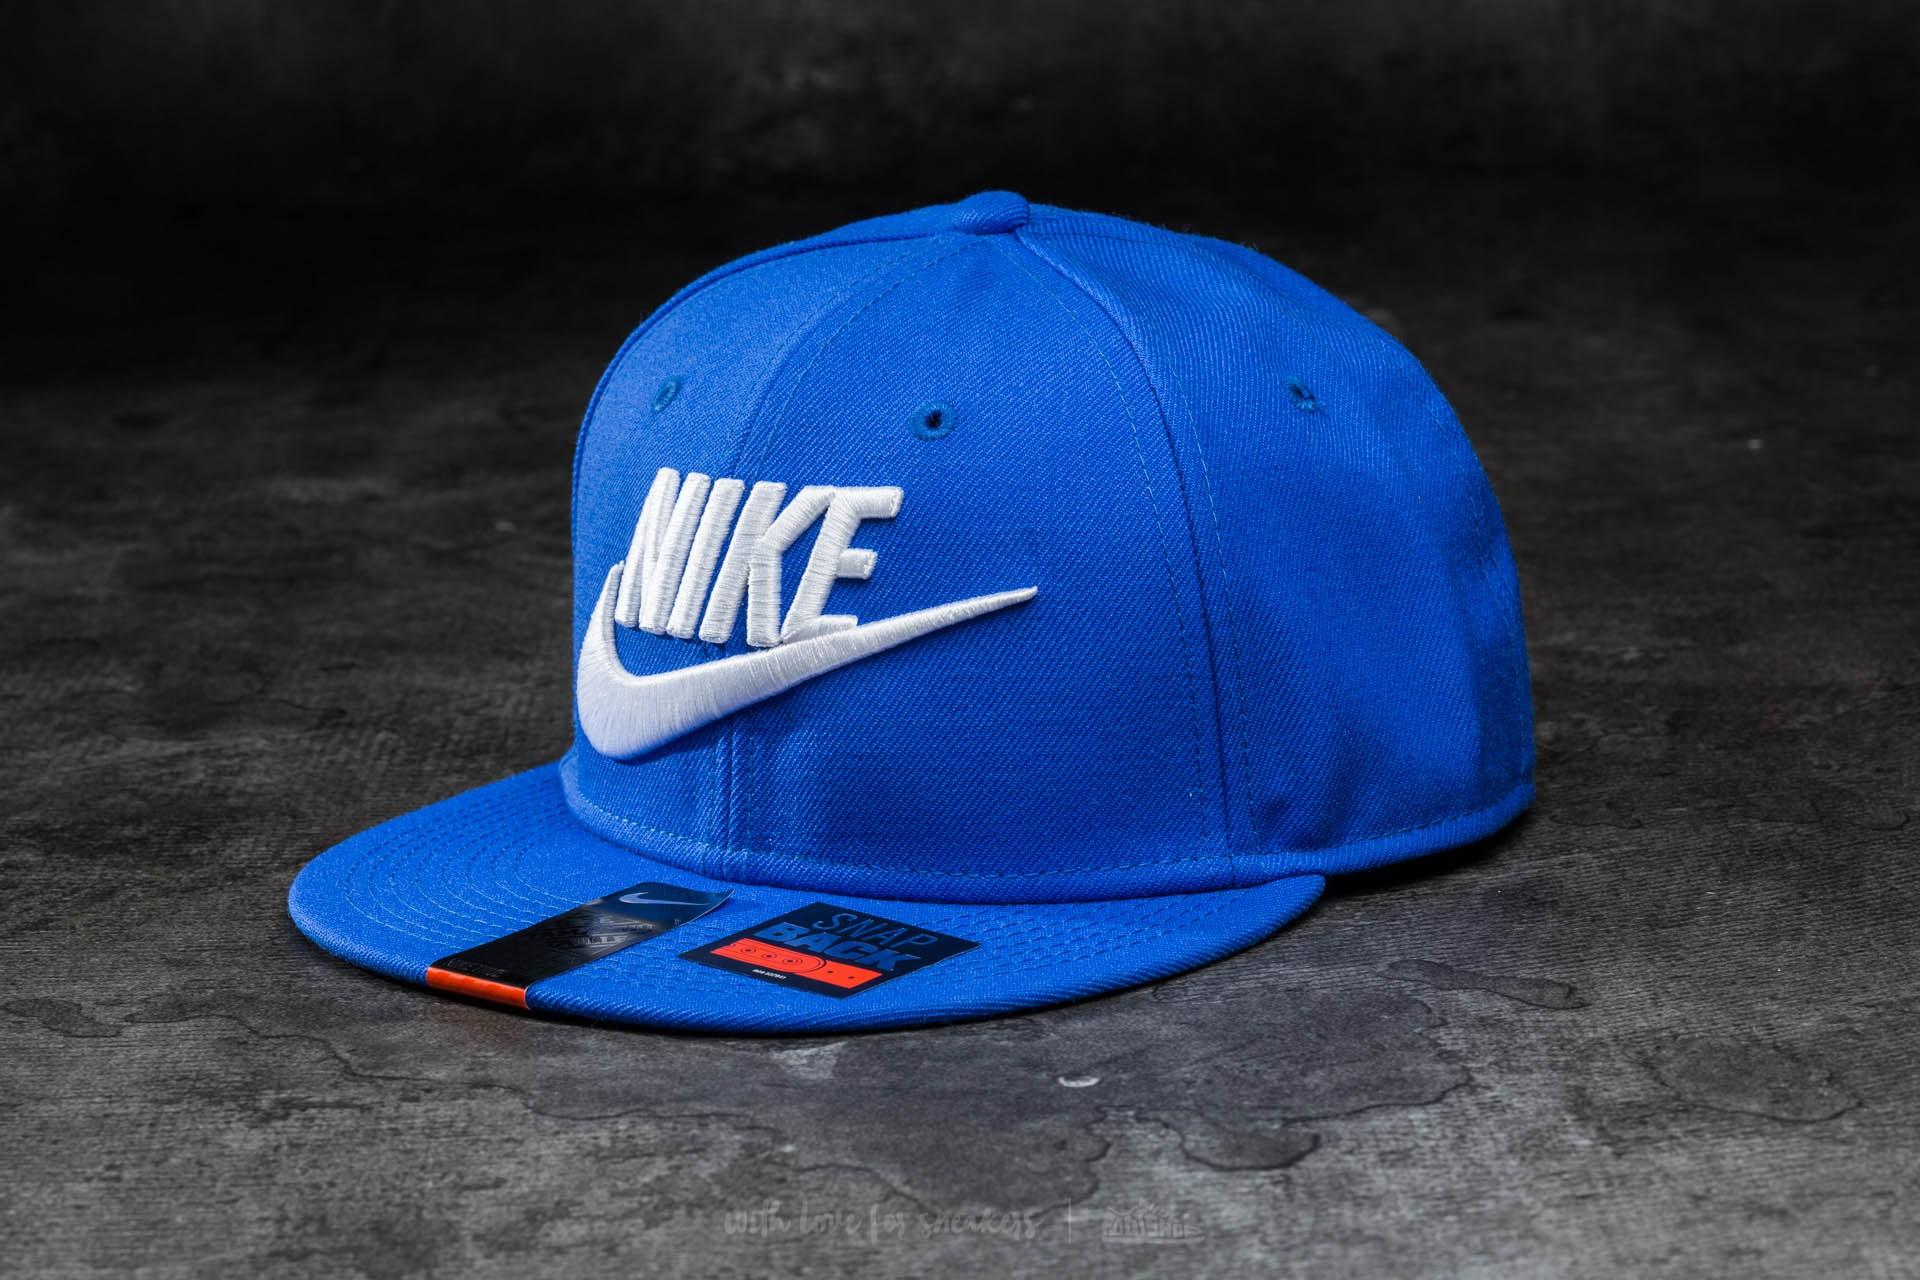 dab3d198643 Nike Futura True Red Snapback Royal Blue